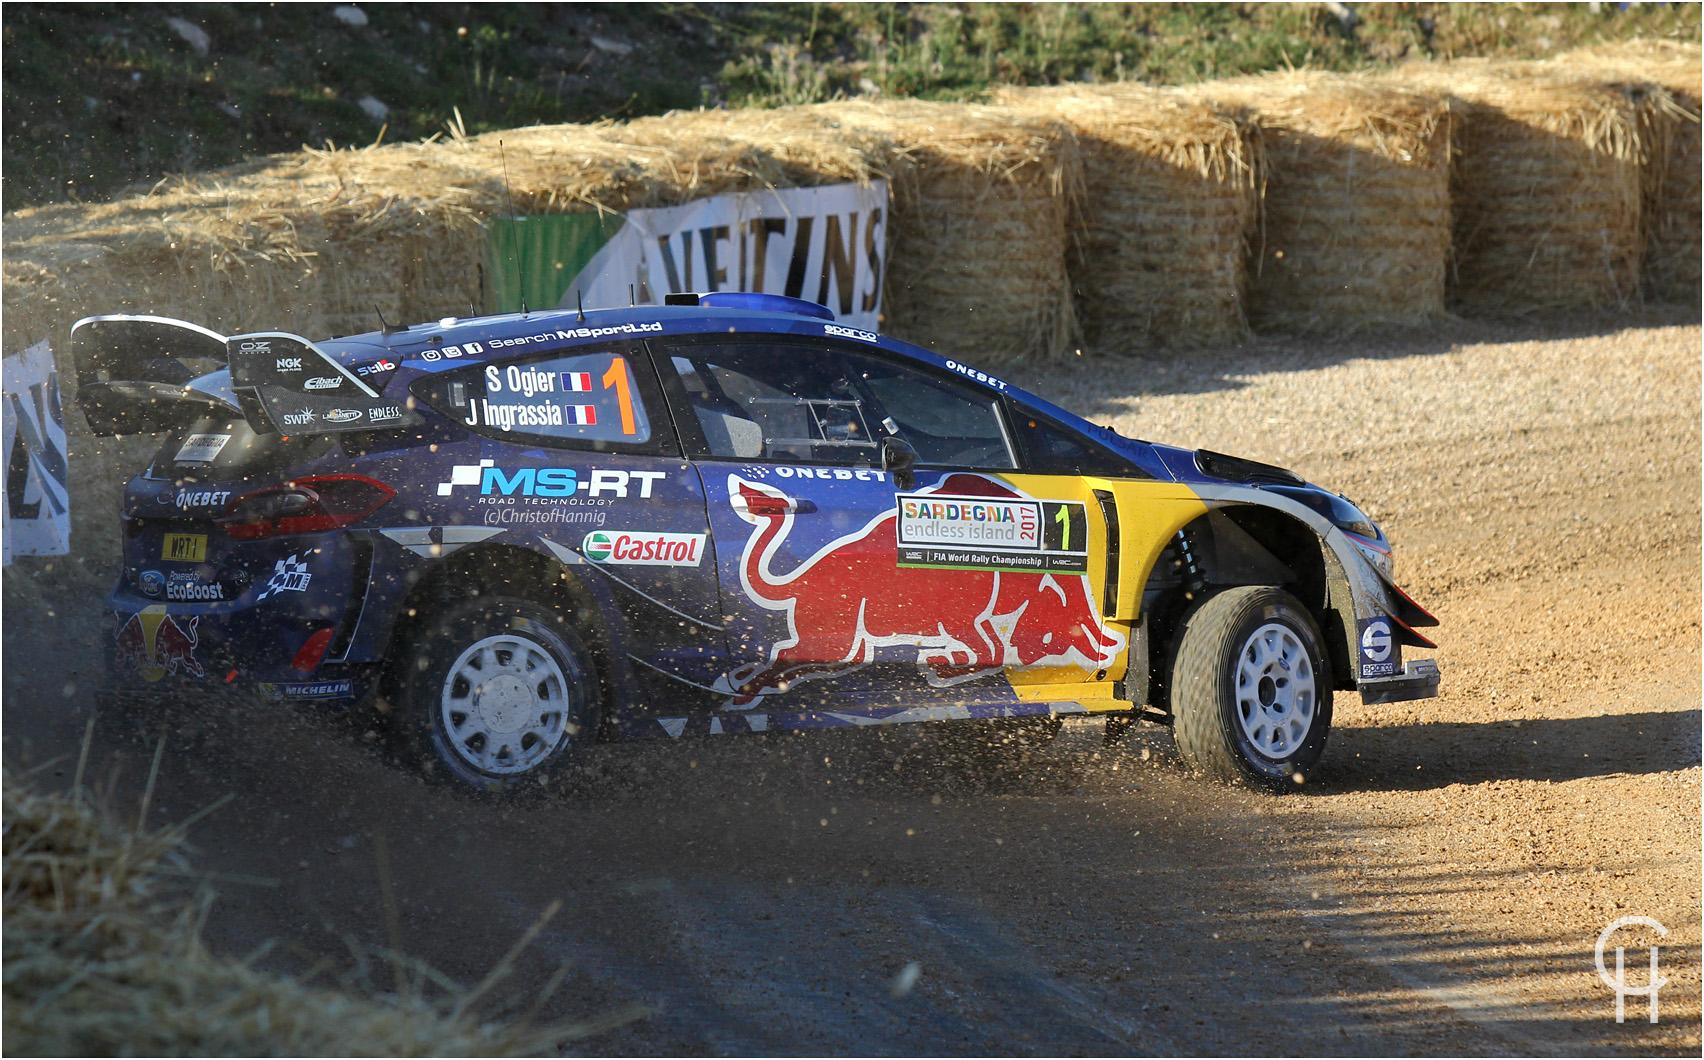 Die fünffachen Weltmeister Sebastian Ogier / Julien Ingrassia im Ford Fiesta WRC